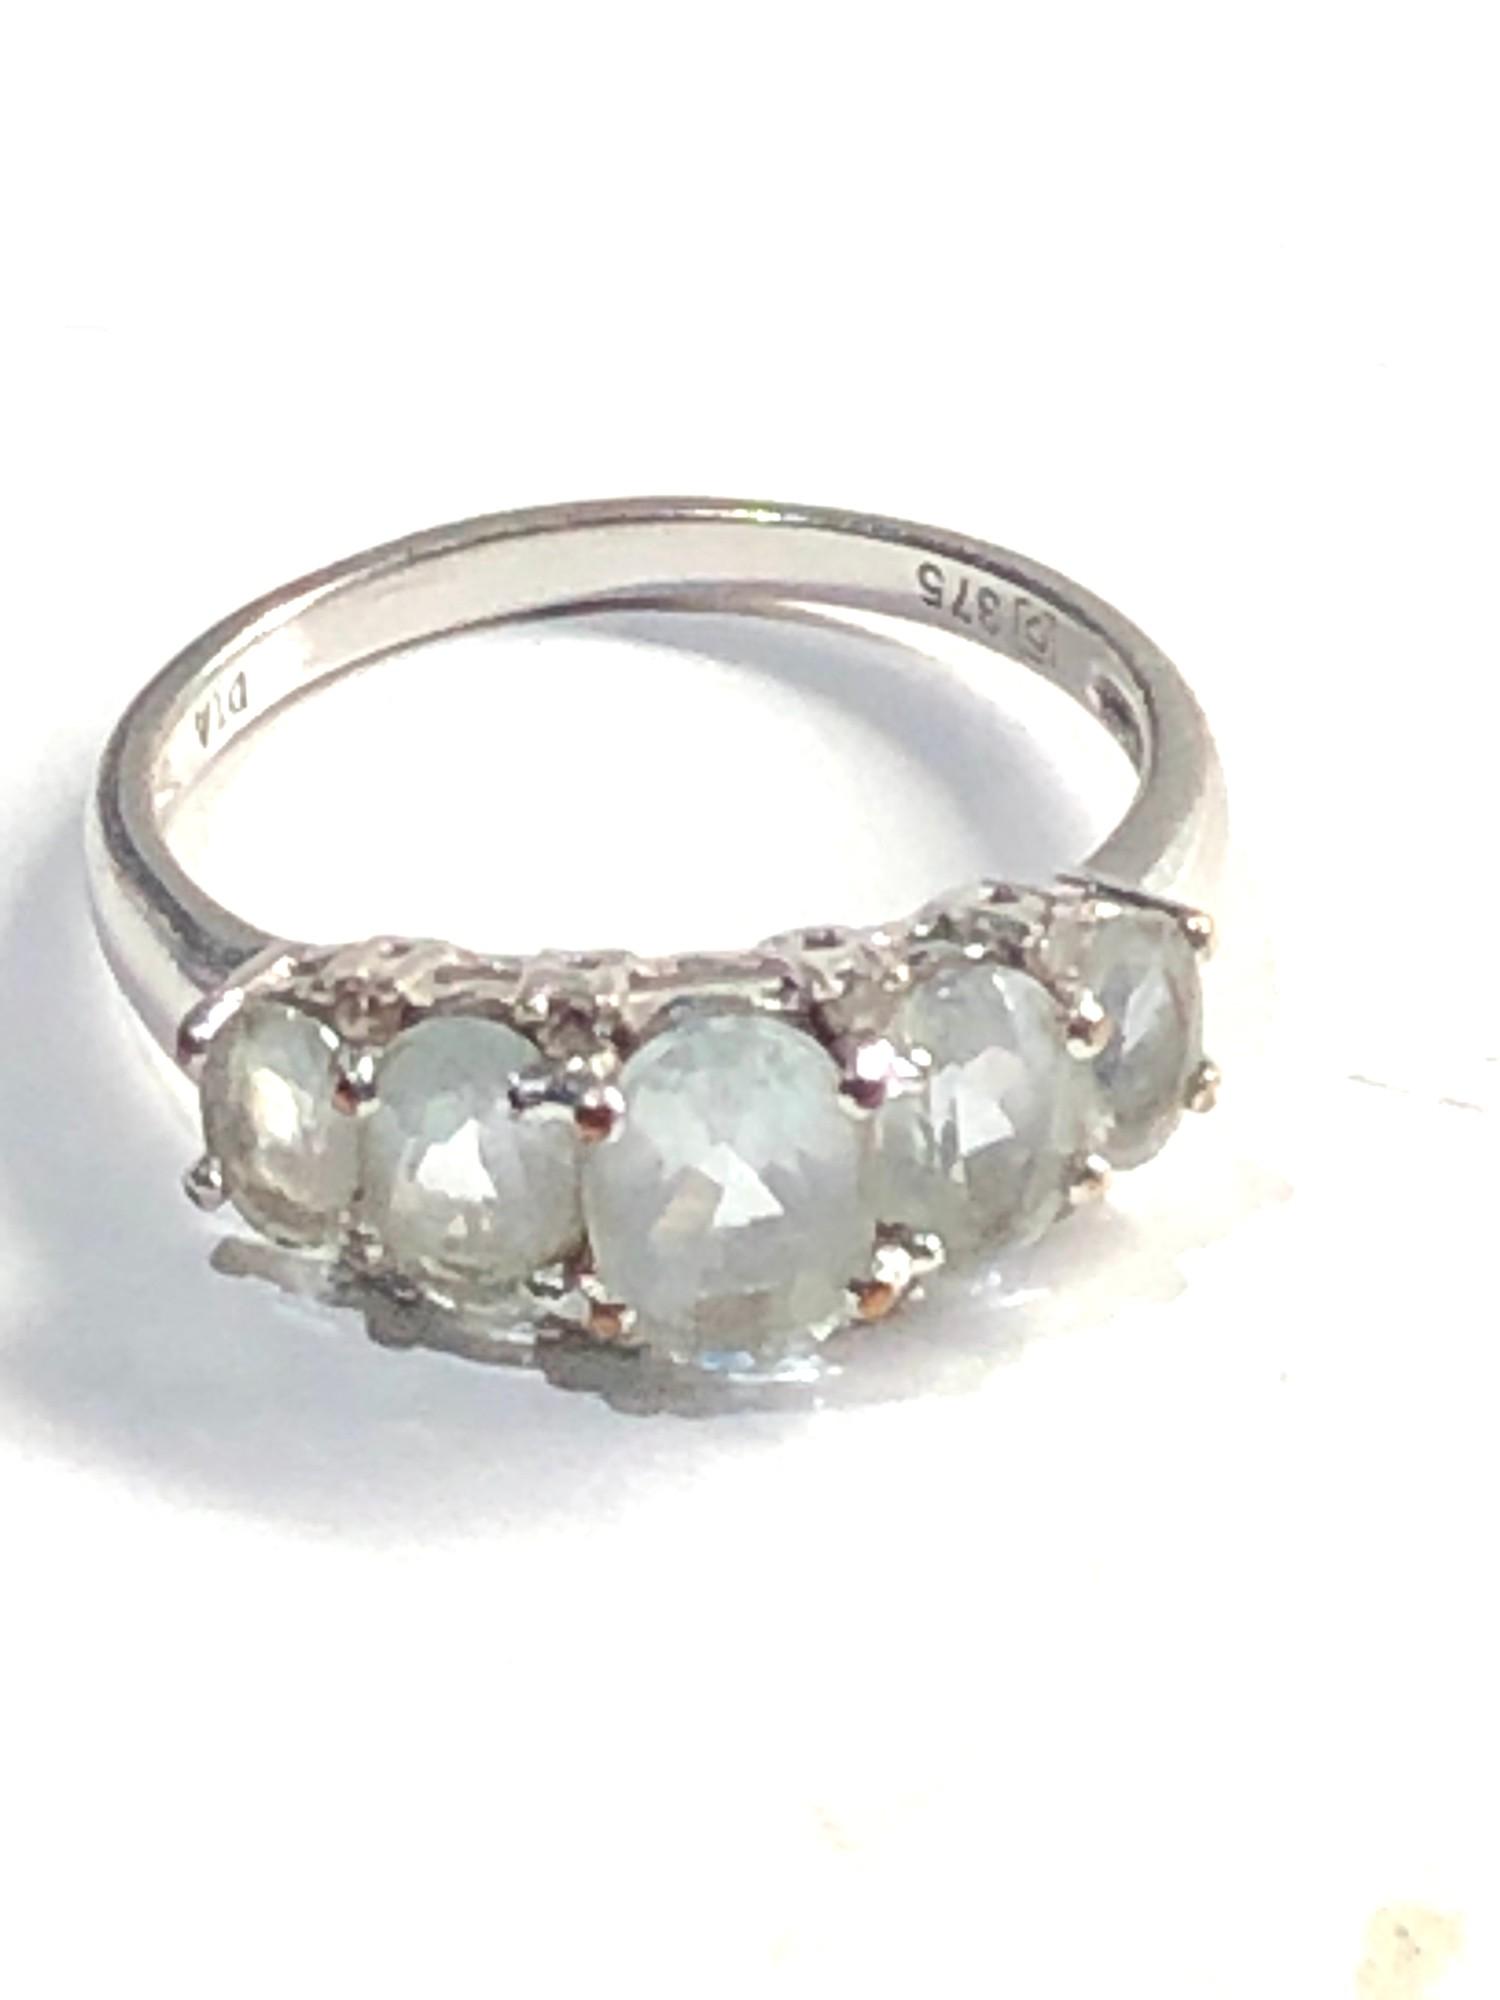 9ct White gold aquamarine 5 stone ring with diamond accents 2.7g